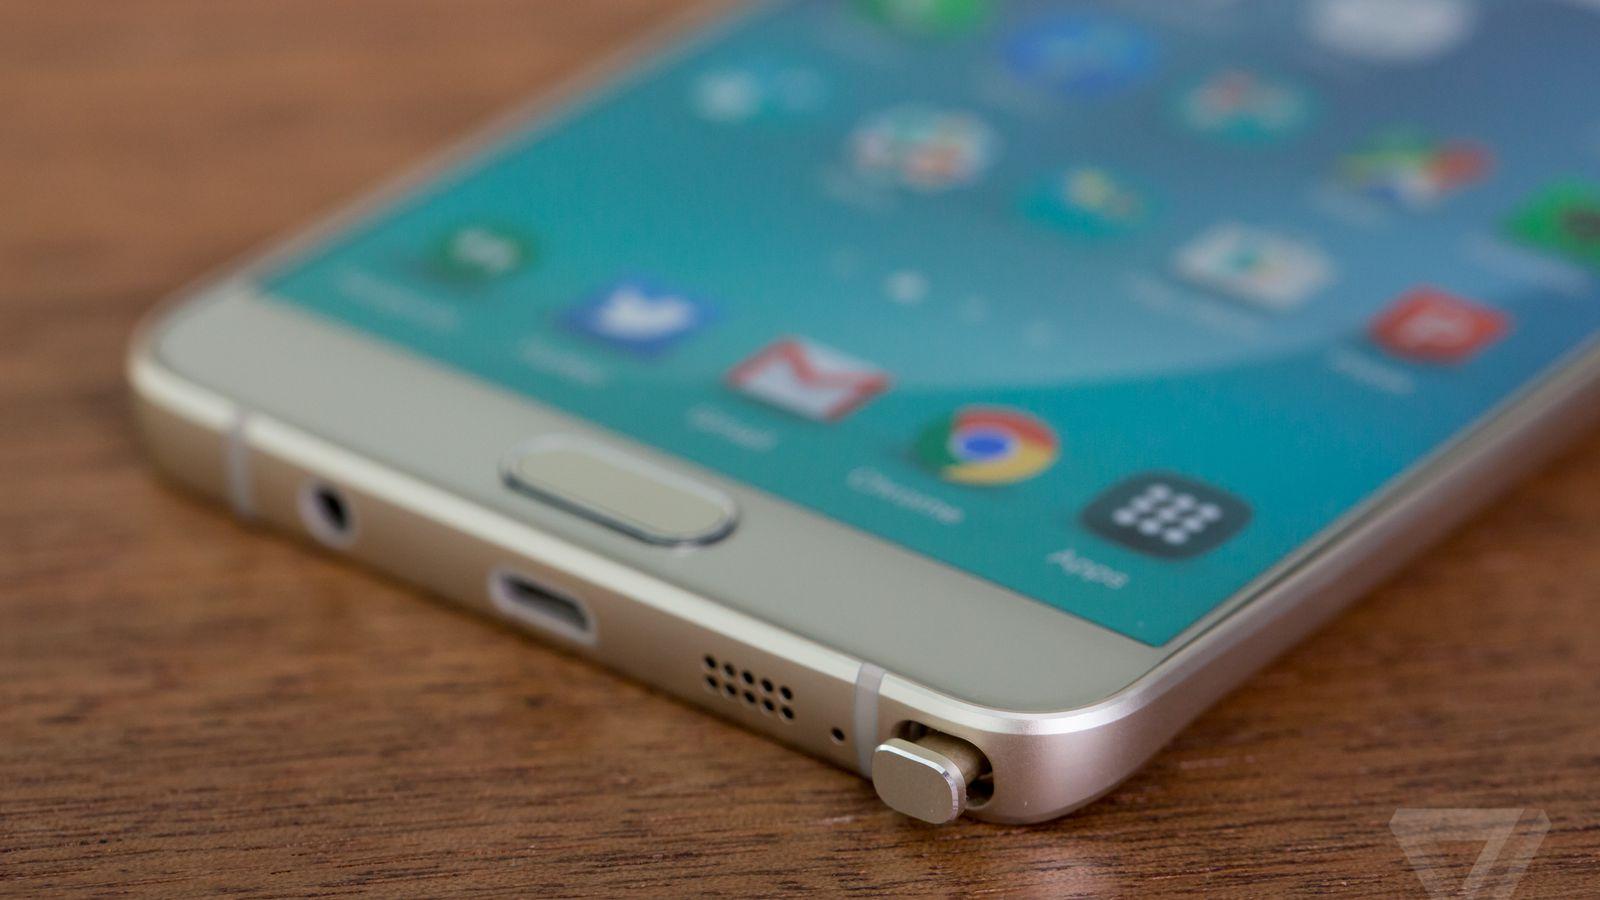 Samsung On Galaxy Note 5 39 S Broken Stylus Slot Read The